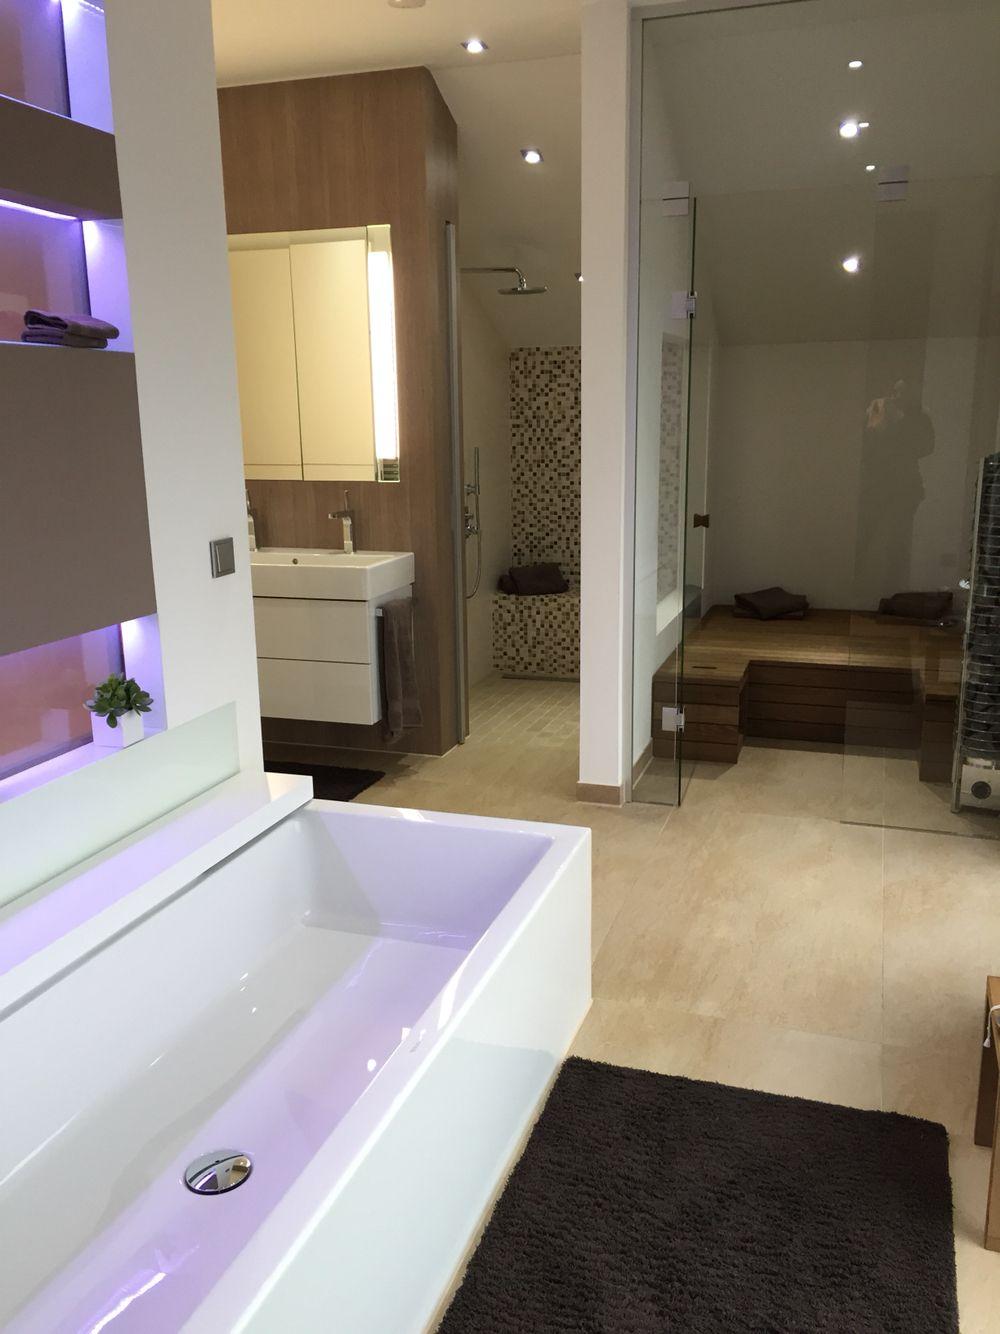 Tolles großes Badezimmer | Unser Haus - Masterbad | Pinterest ...